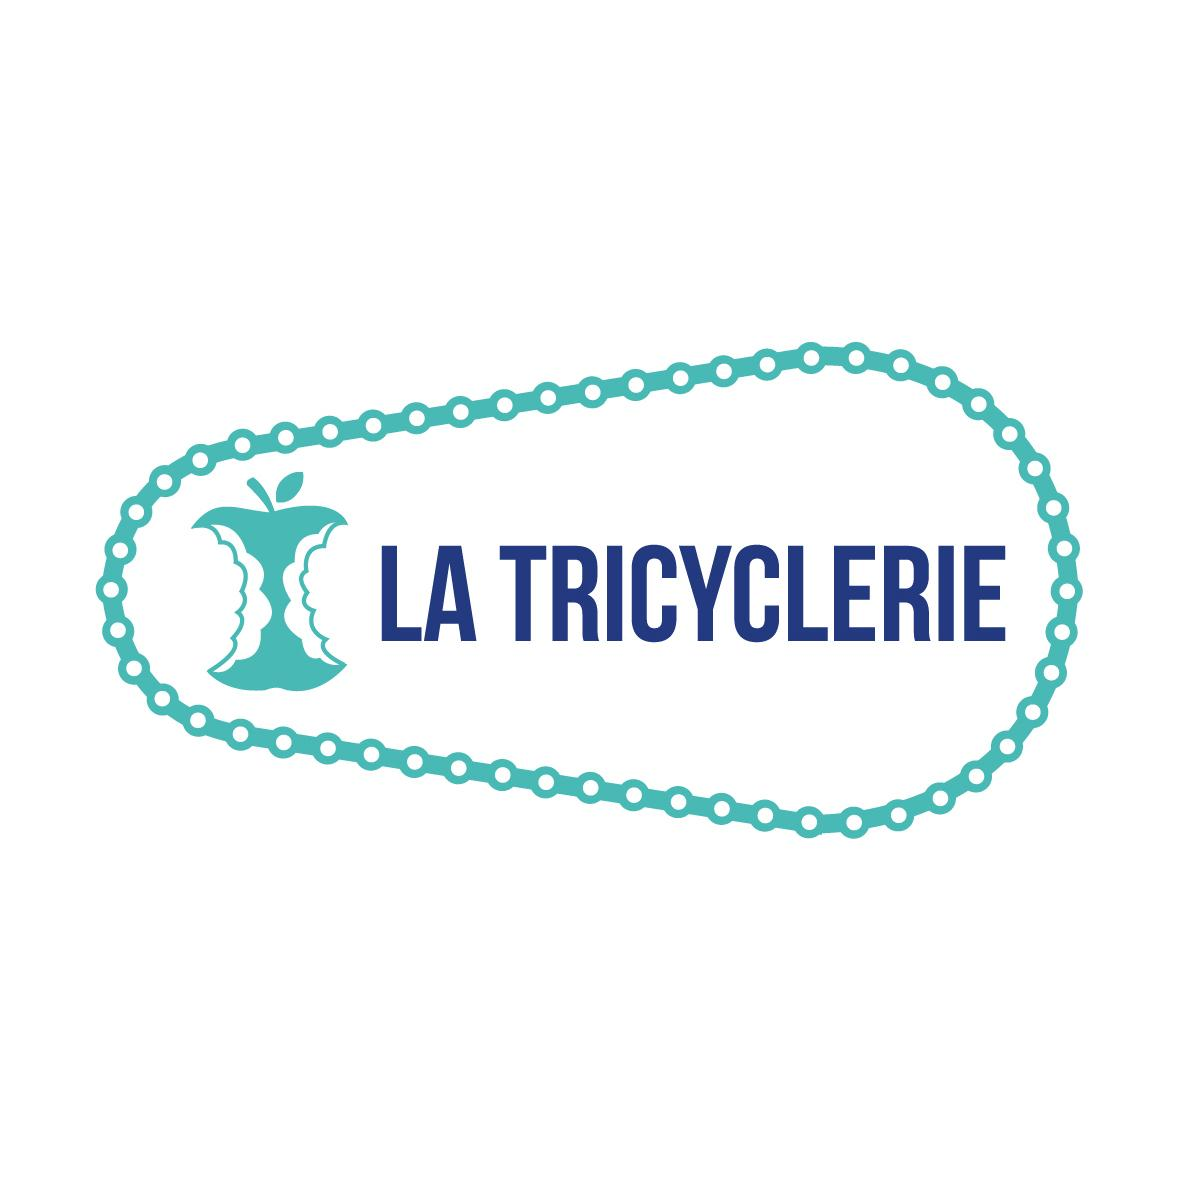 La Tricyclerie logo